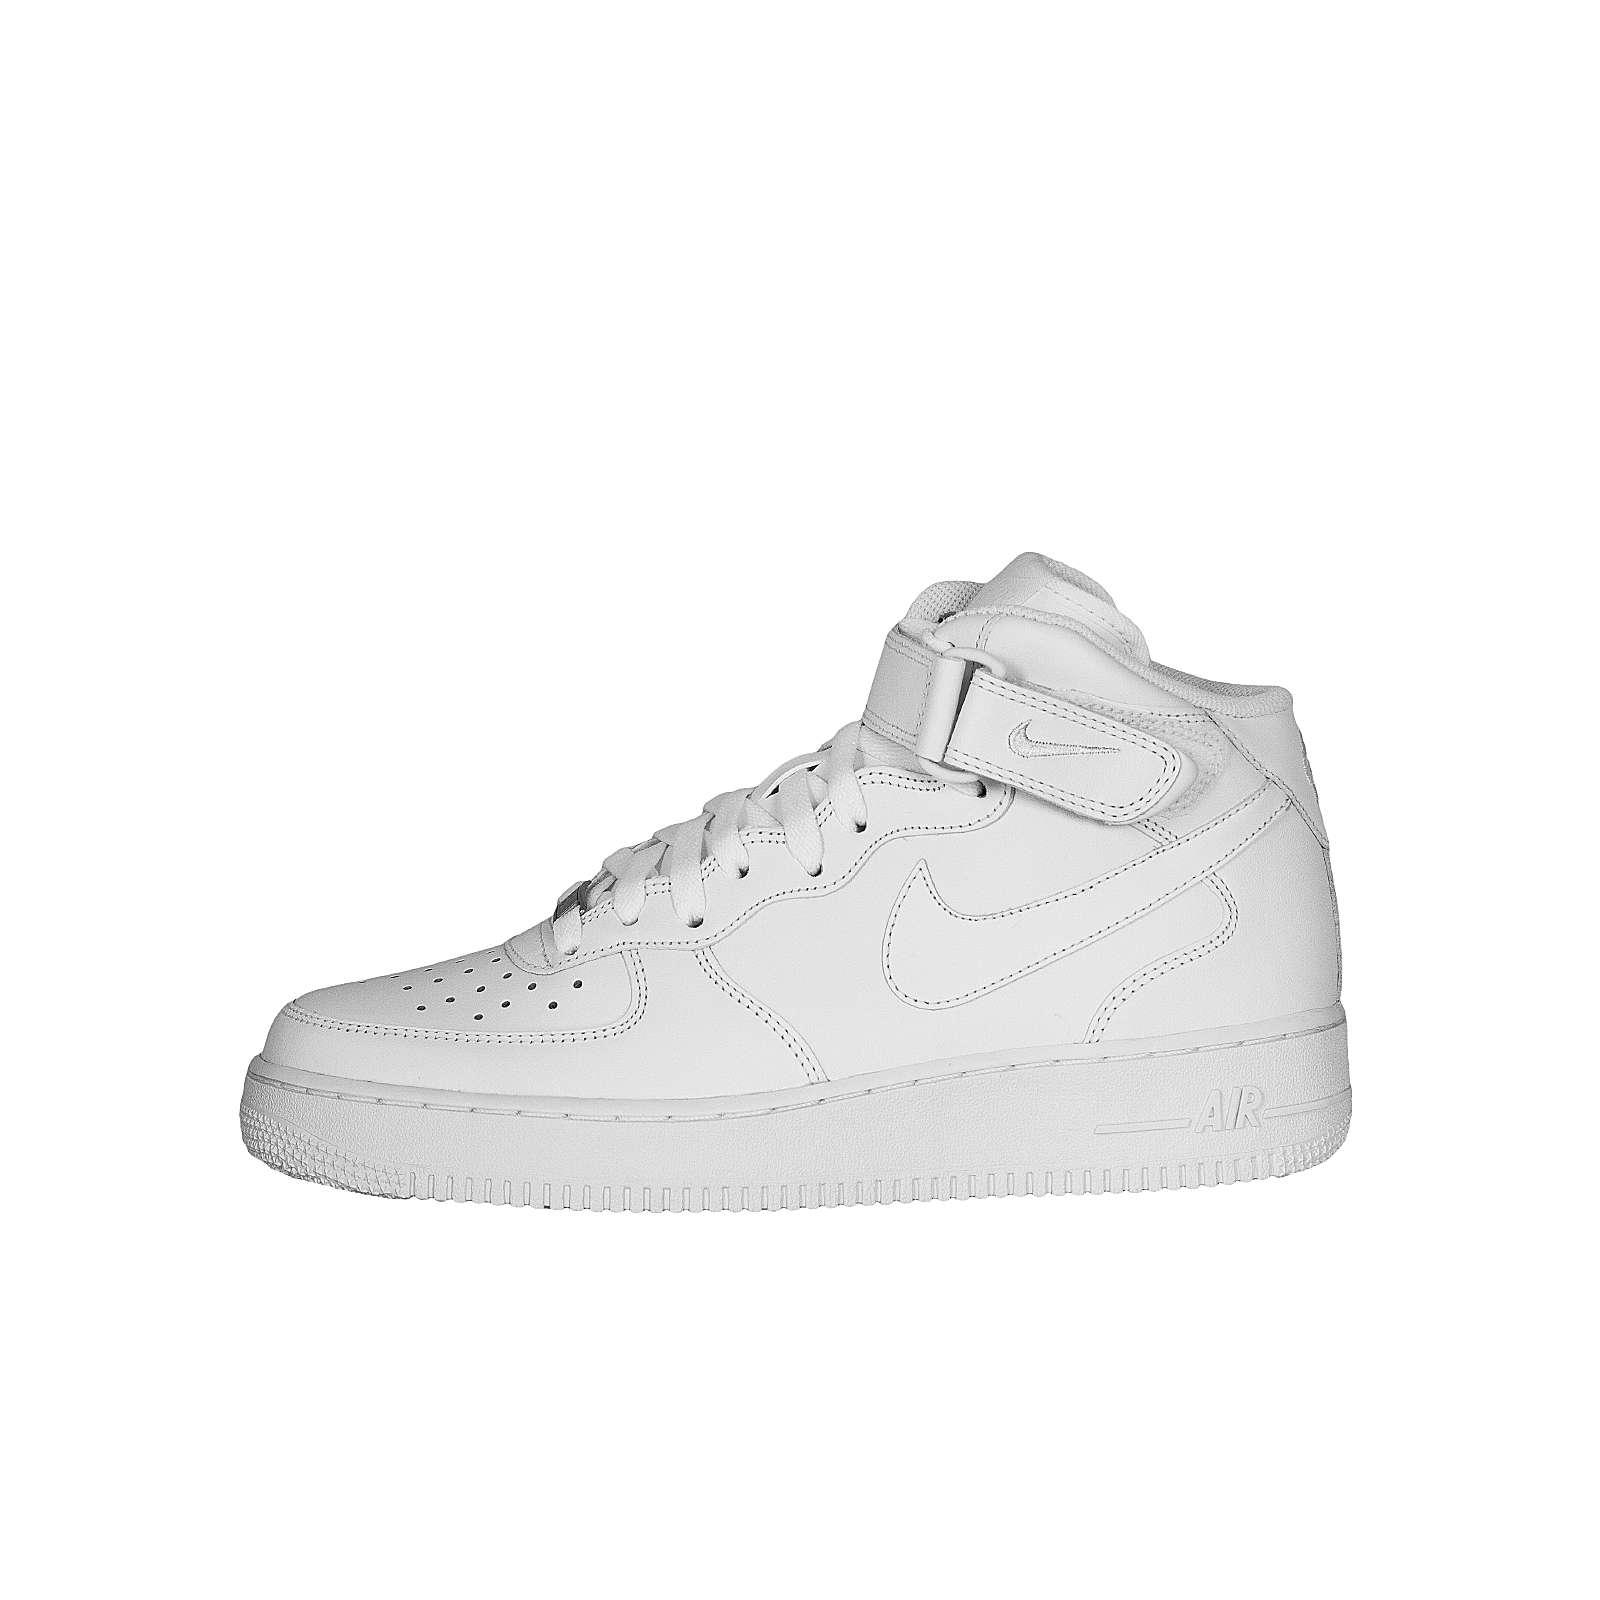 Nike Sportswear Sneakers High Air Force 1 MID ´07 weiß Herren Gr. 44,5